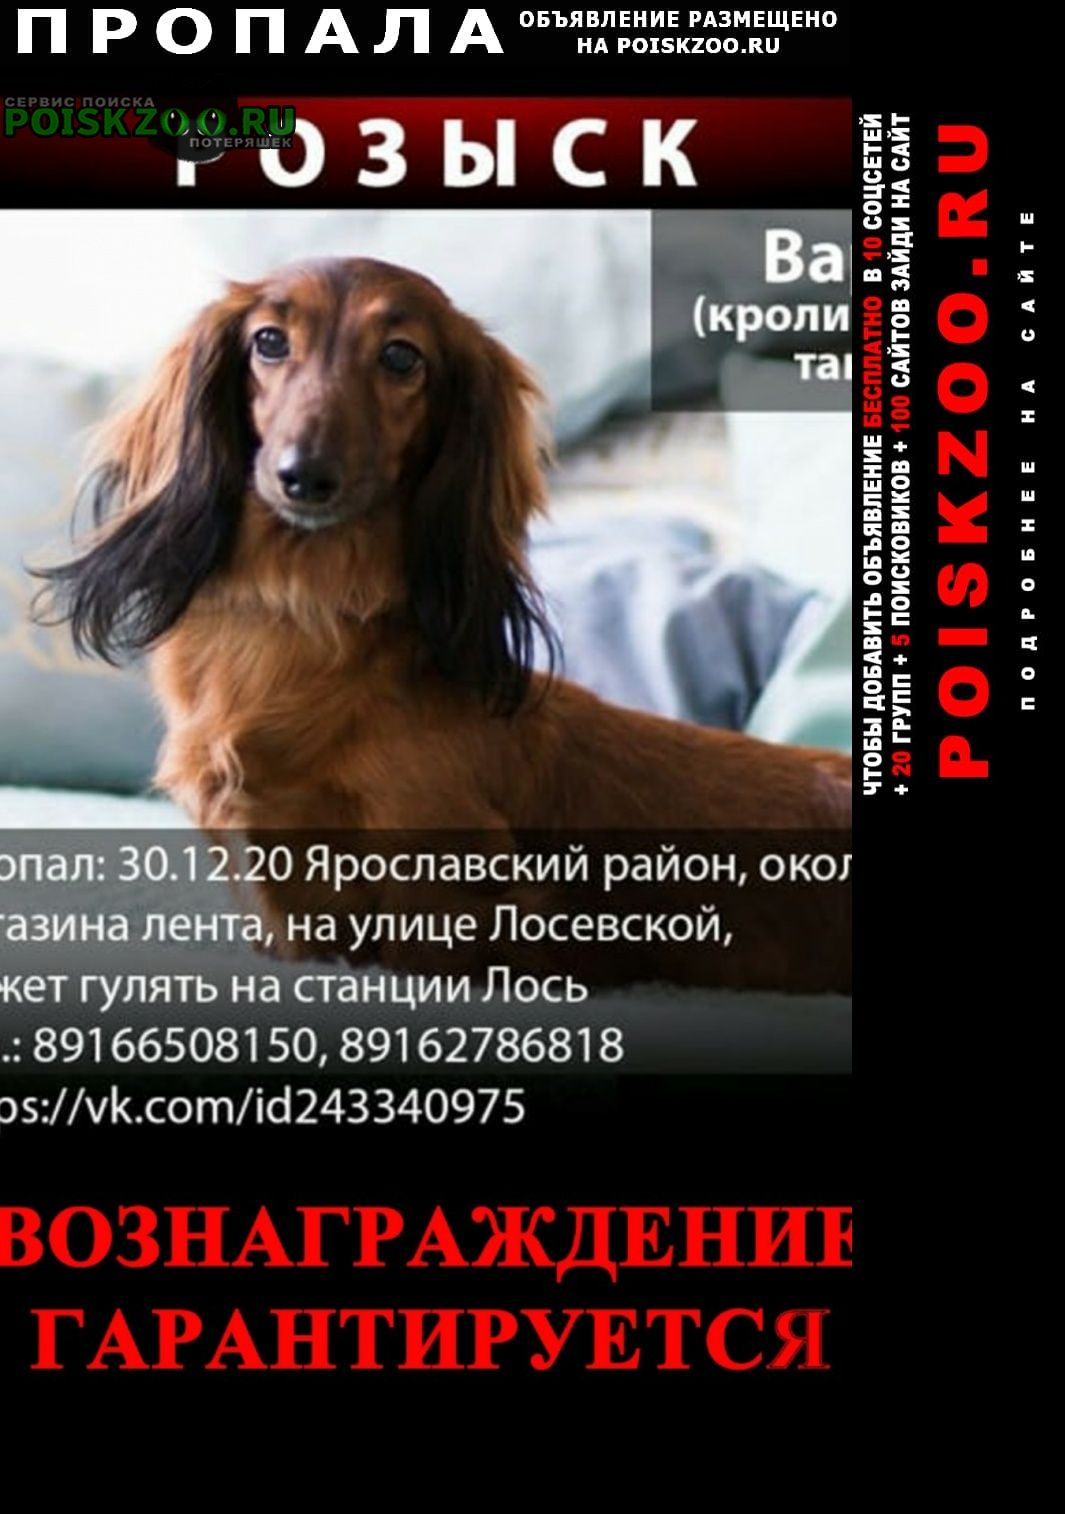 Пропала собака наш ребенок Москва